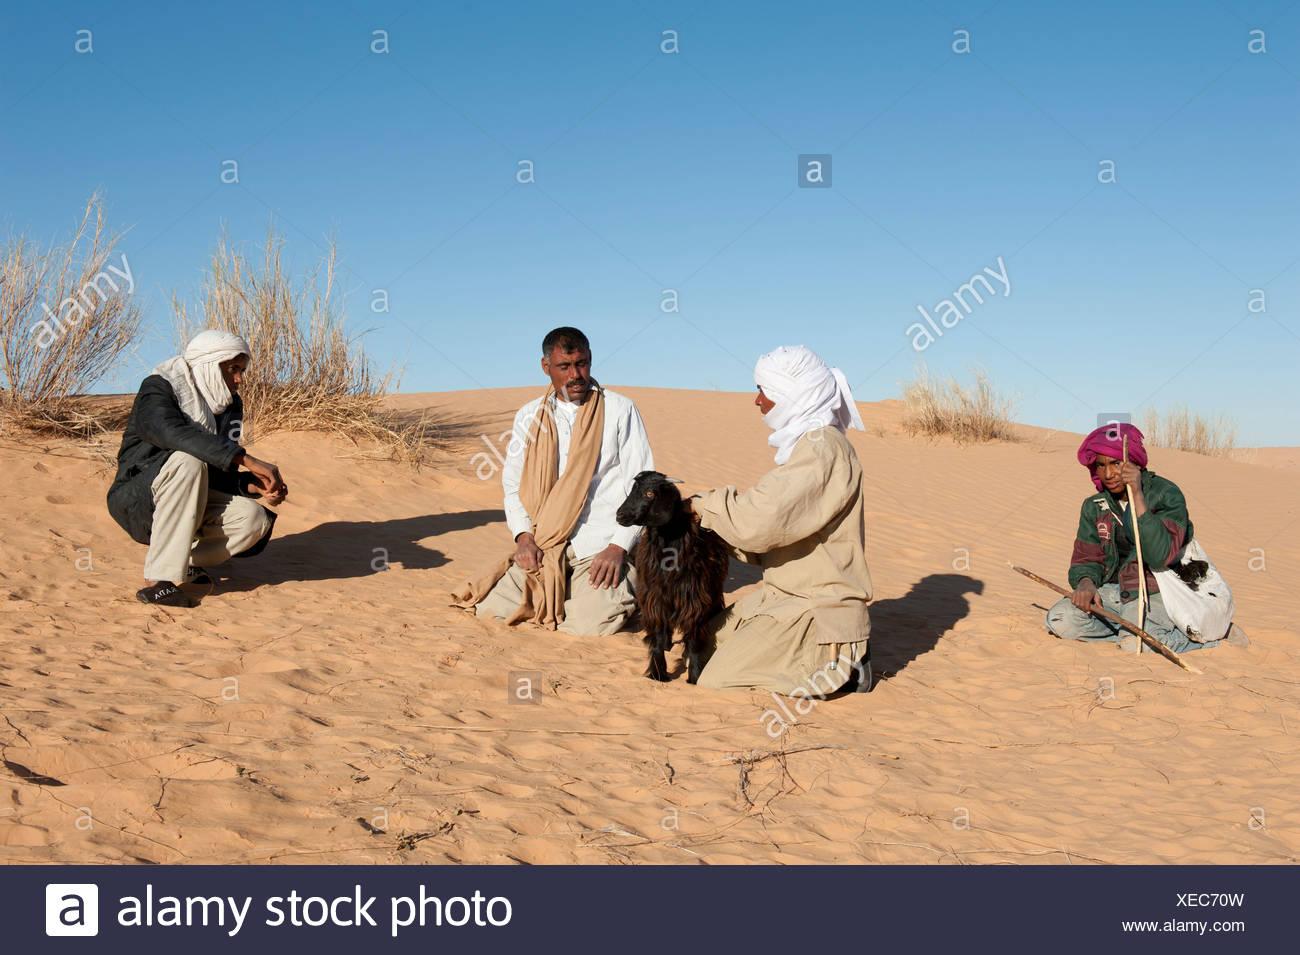 Negotiation, Bedouins buying a goat, sand dunes, Sahara desert between Douz and Ksar Ghilane, Southern Tunisia, Tunisia, Maghreb - Stock Image